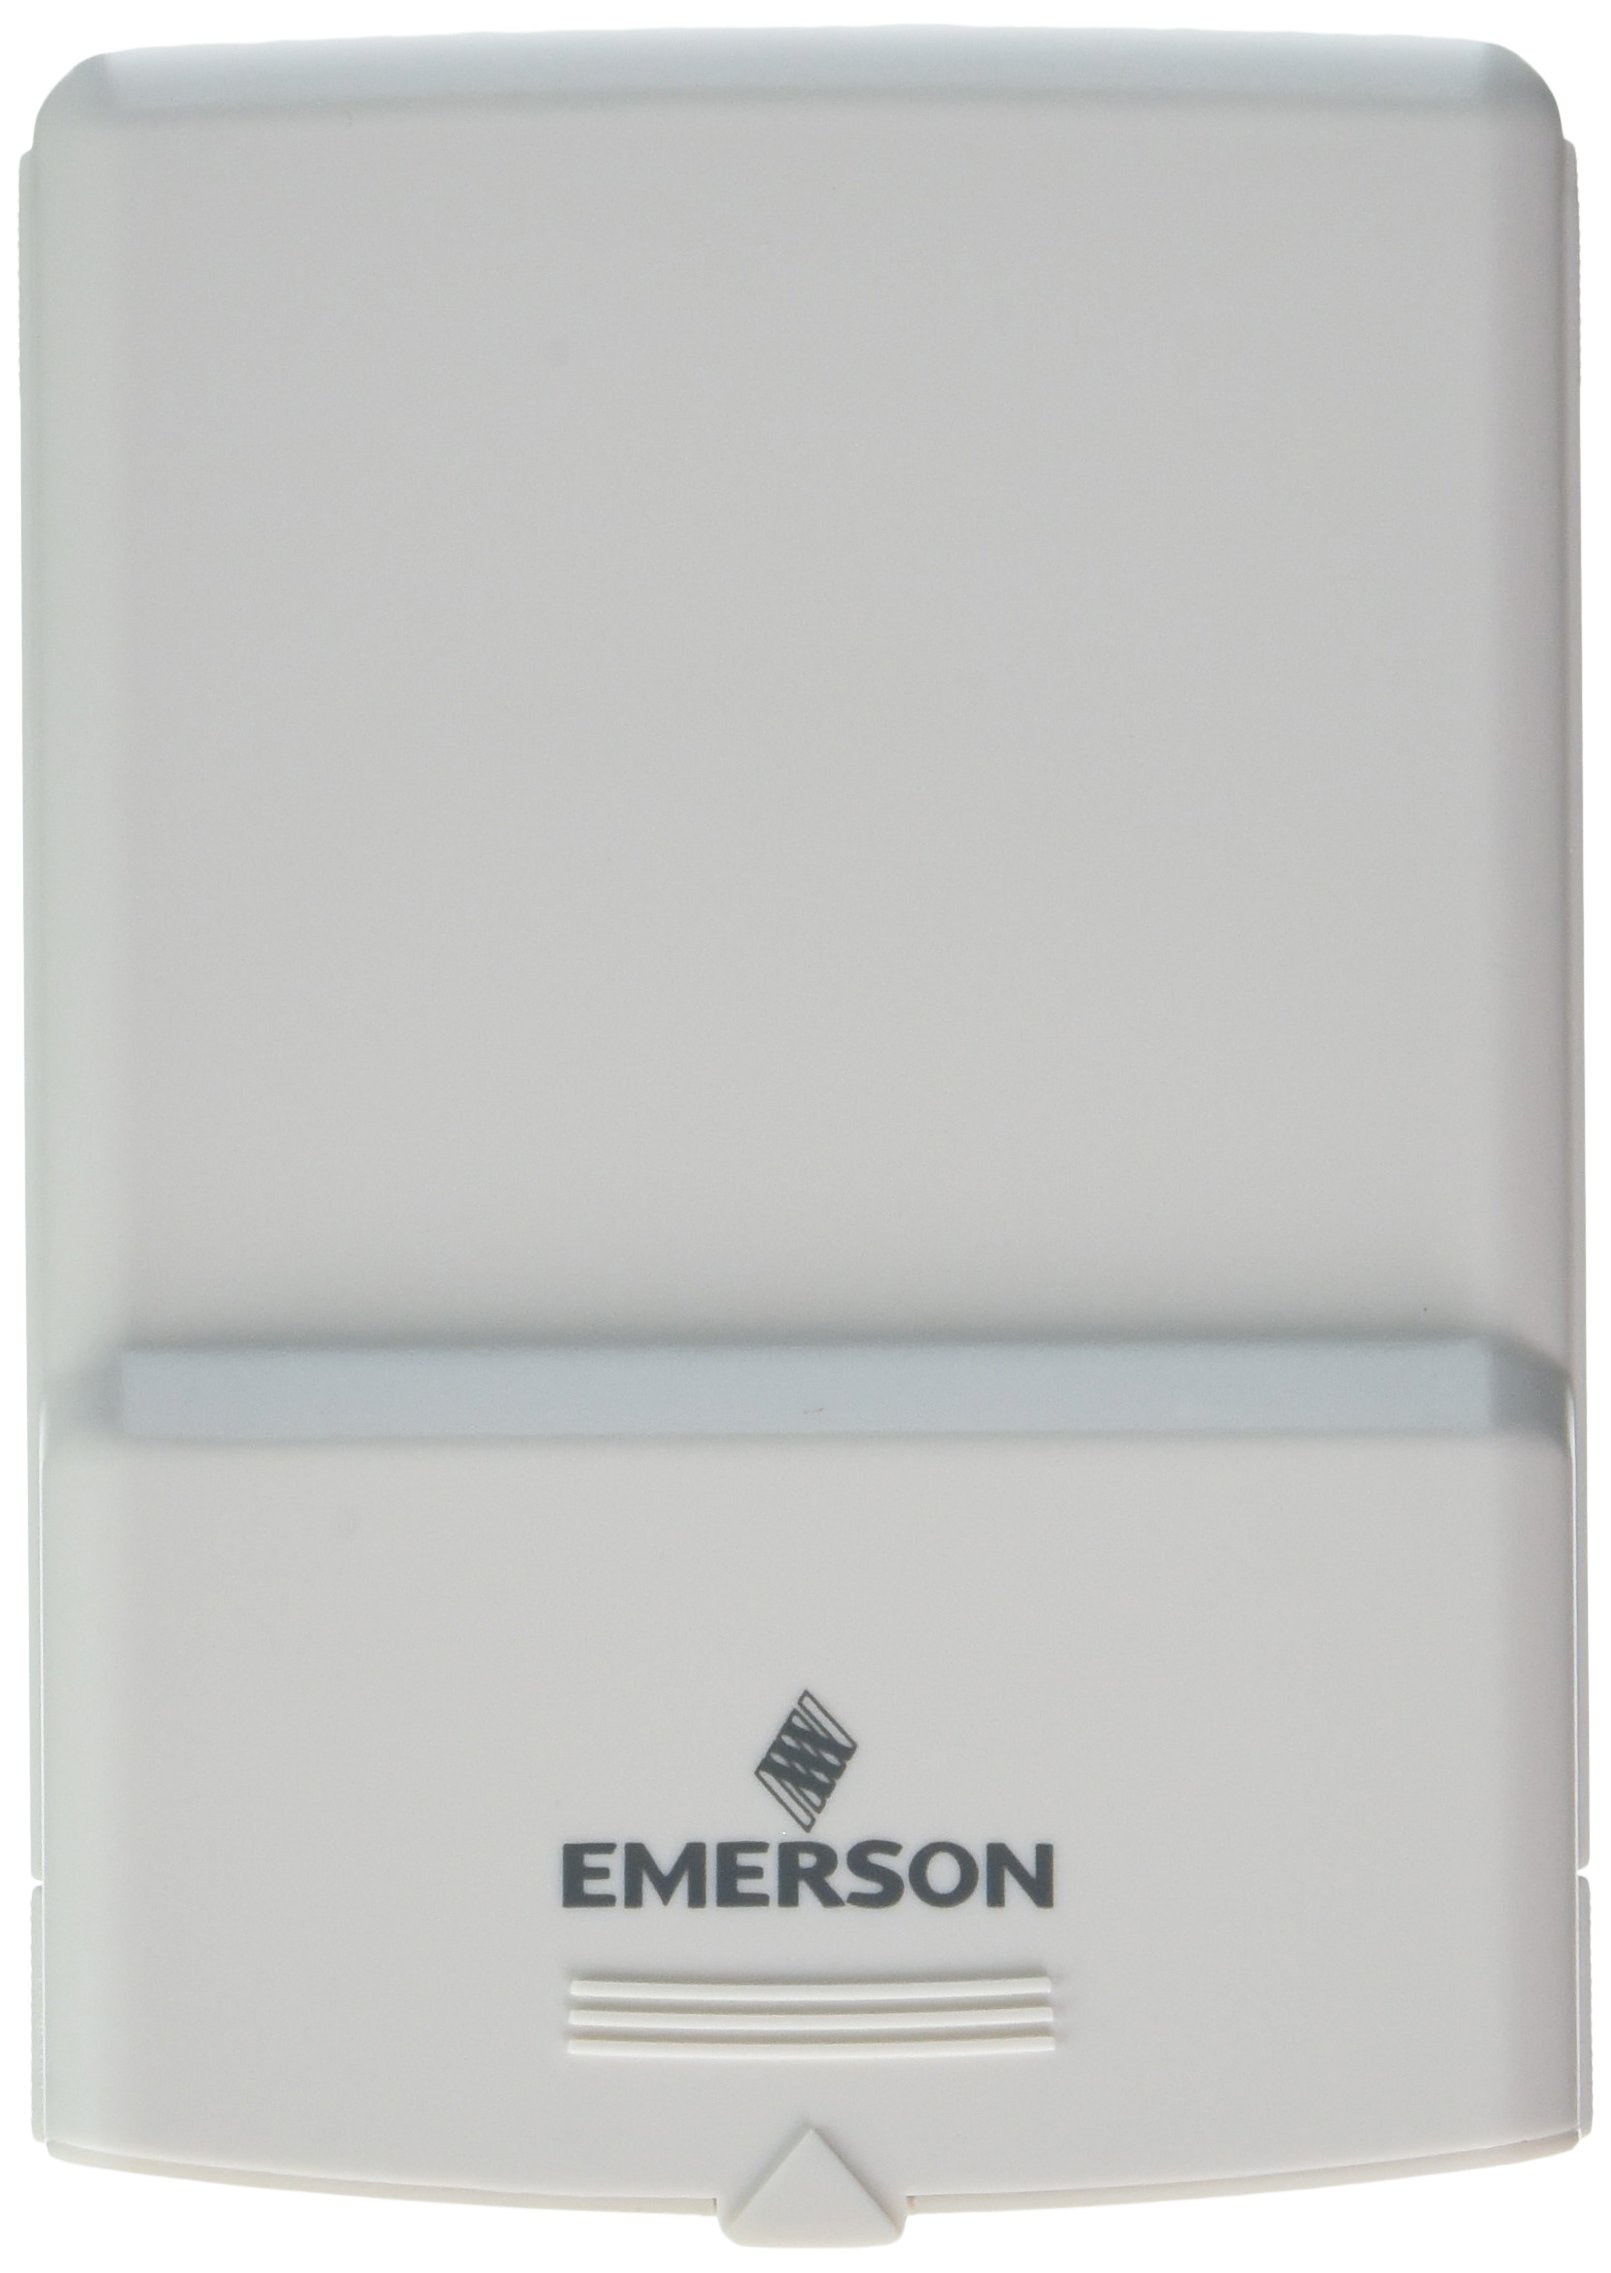 Emerson F145RF-1600 Wireless Remote Indoor or Outdoor Temperature Sensor